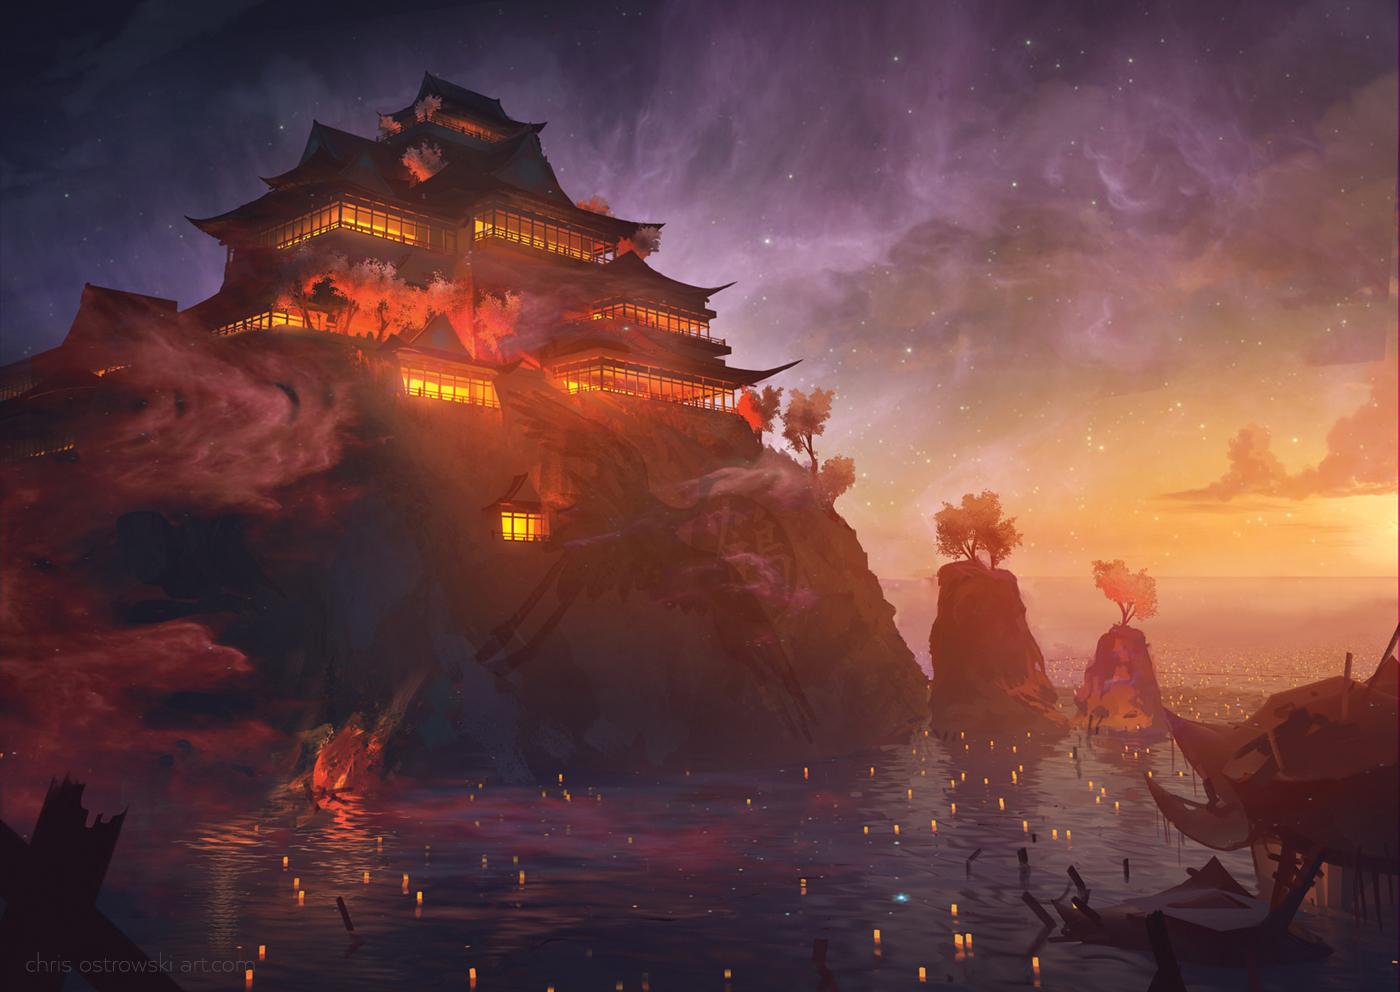 The Esteemed Palace by najtkriss